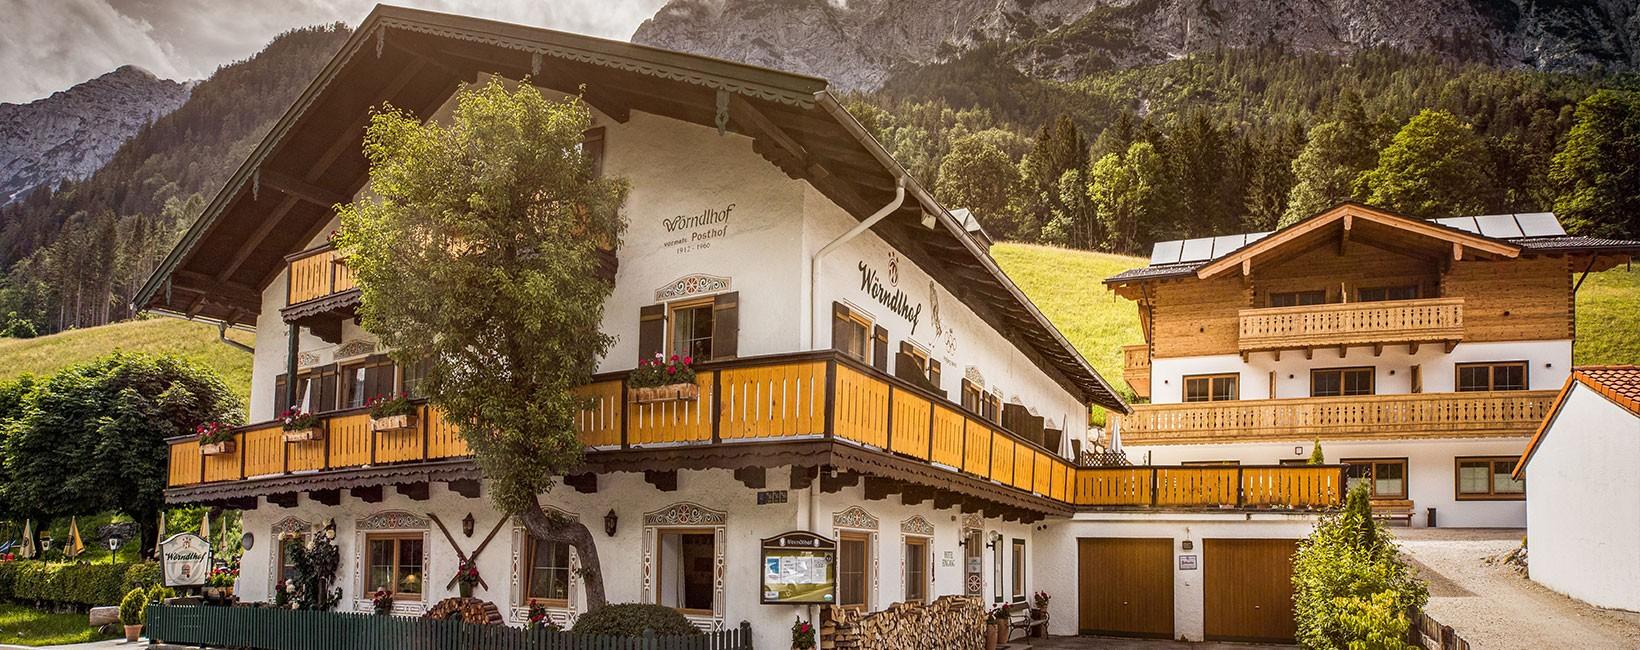 Hotel-Gasthof Wörndlhof-Das Refugium Hintersee-Ramsau